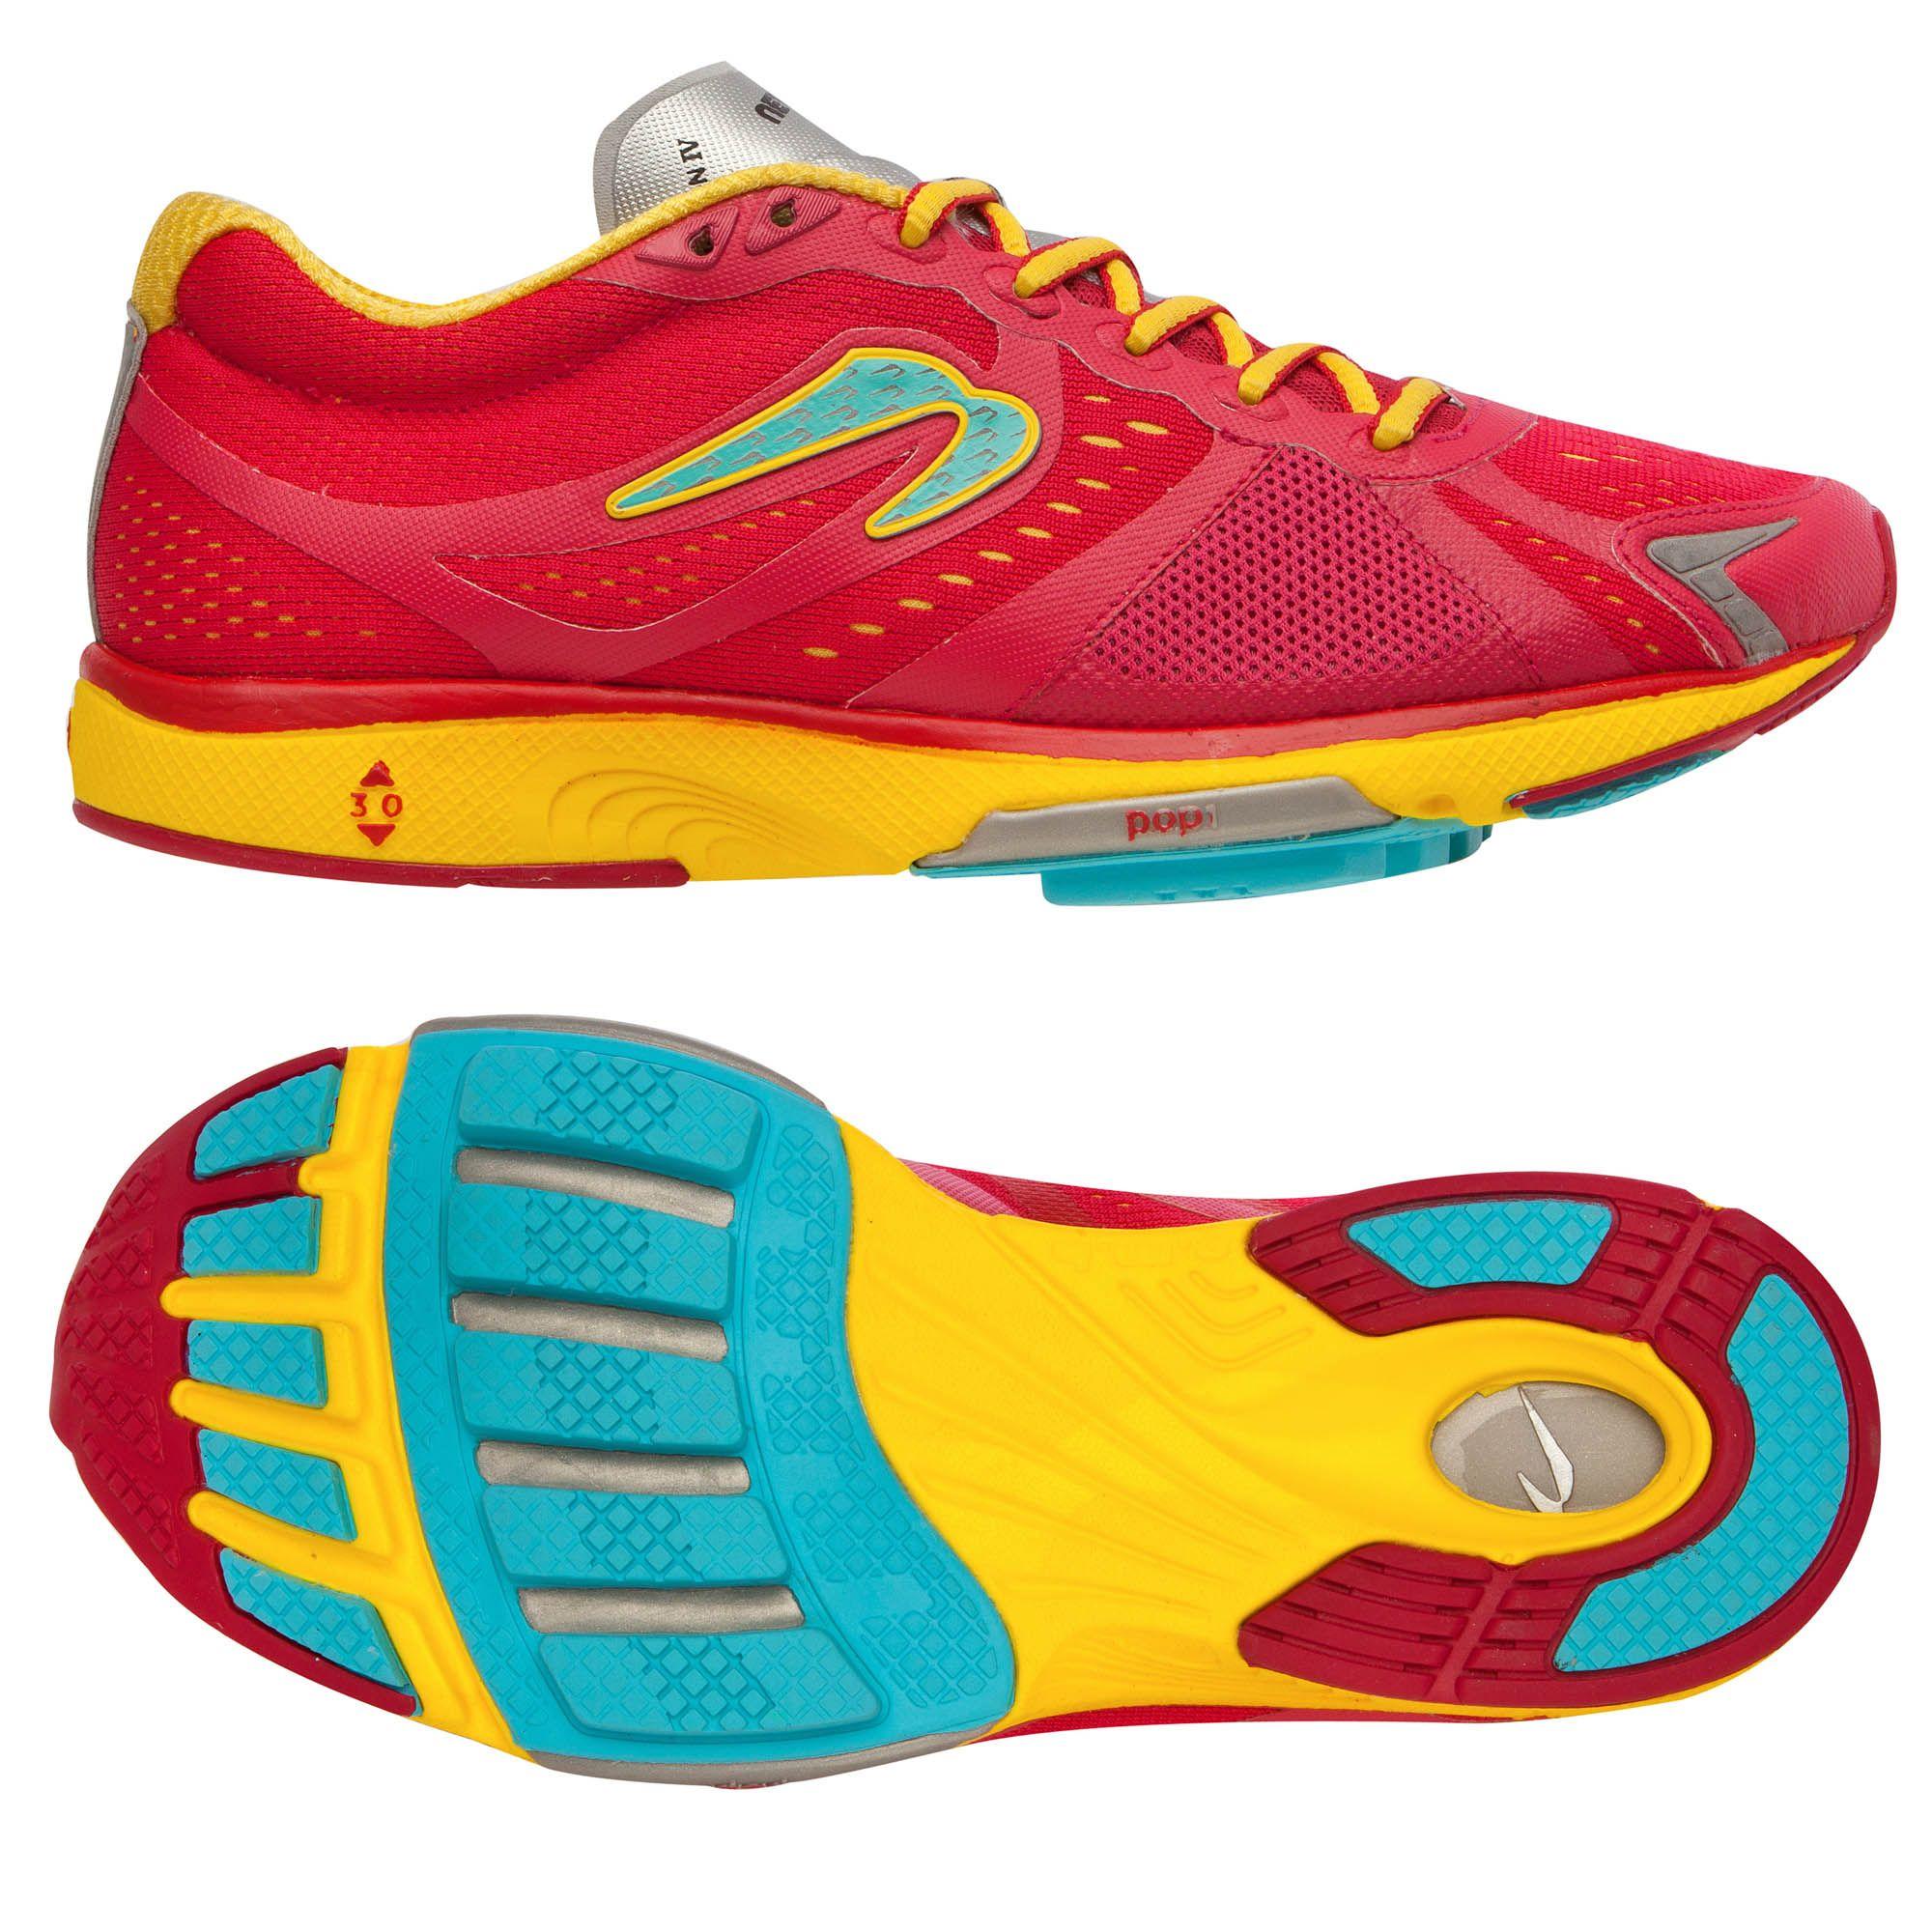 Minimalist Running Shoes For Overpronators